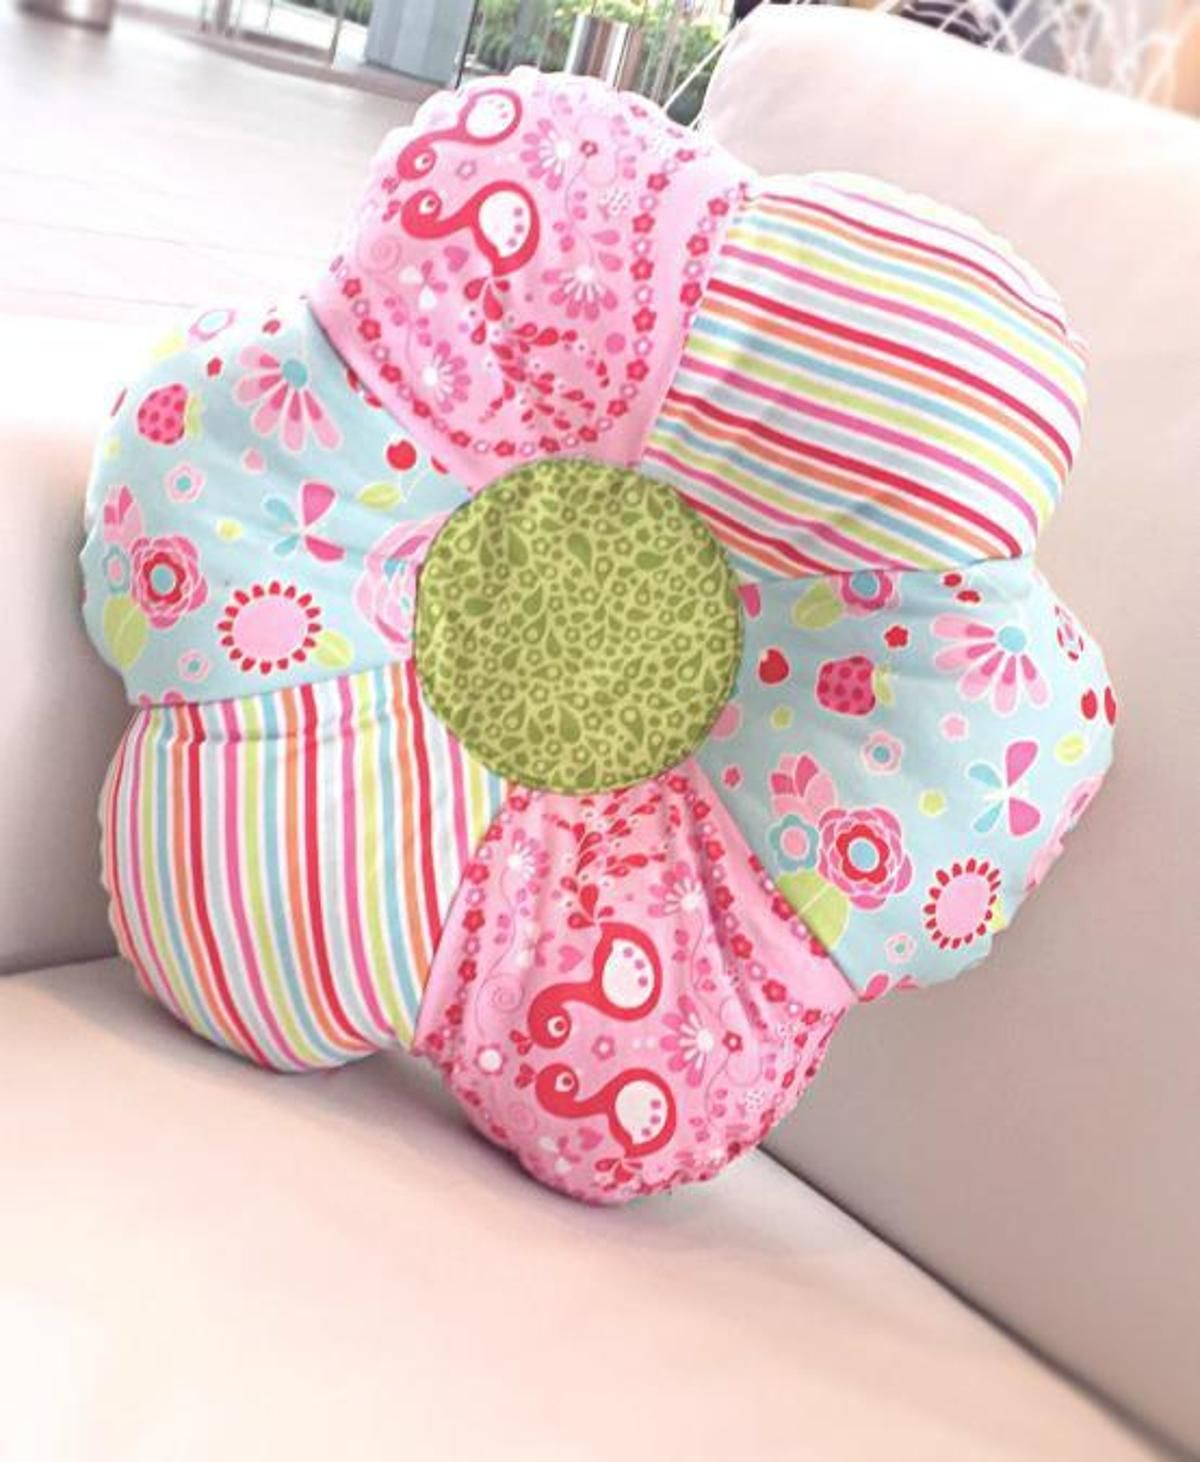 Creative flower shaped cushion pillow